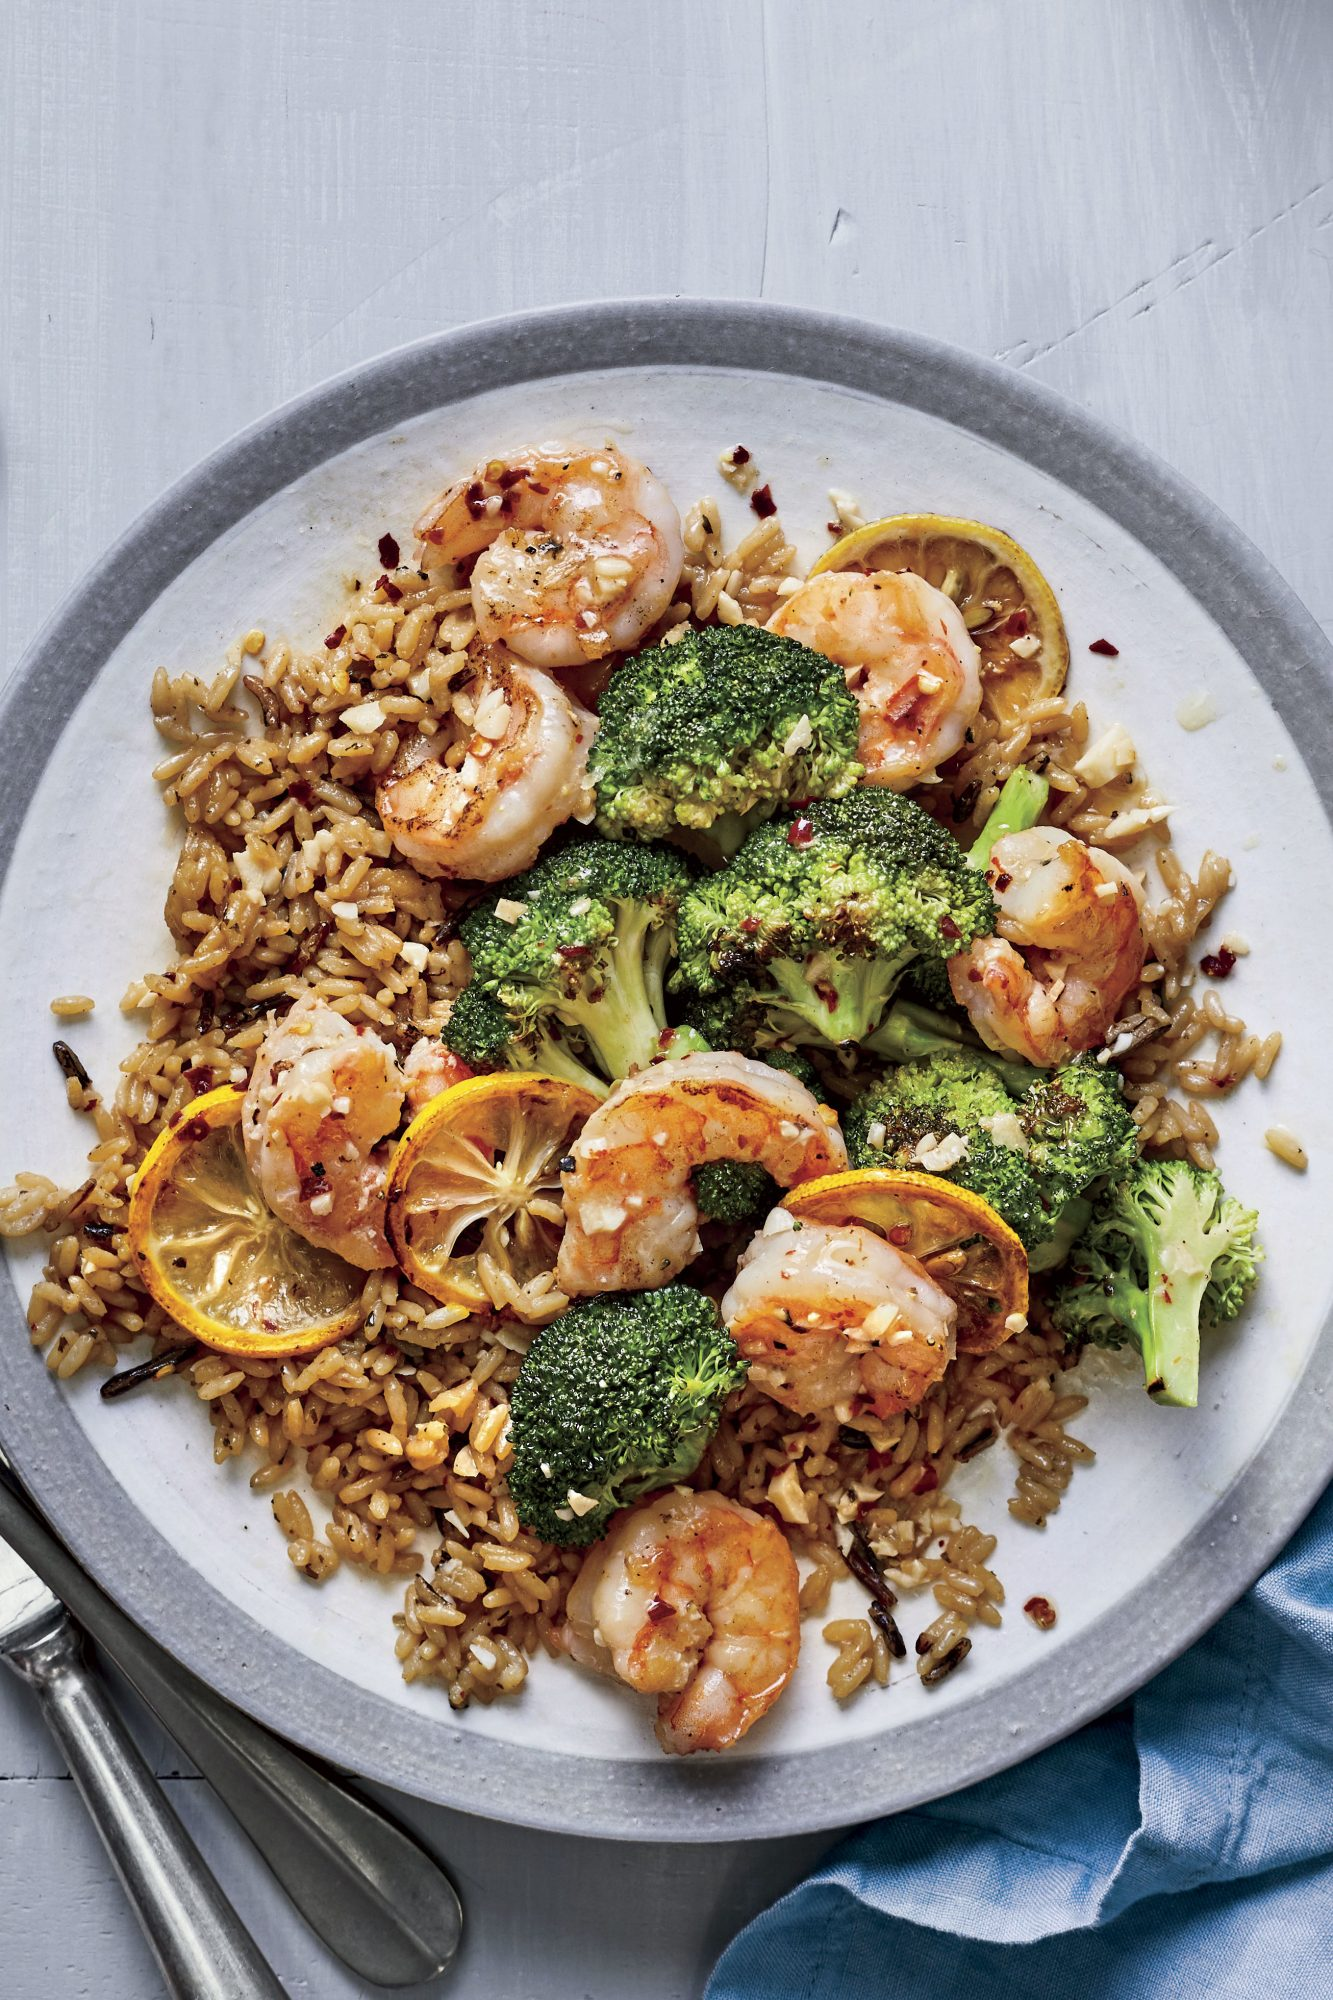 Lemon-Garlic Butter Shrimp with Broccoli